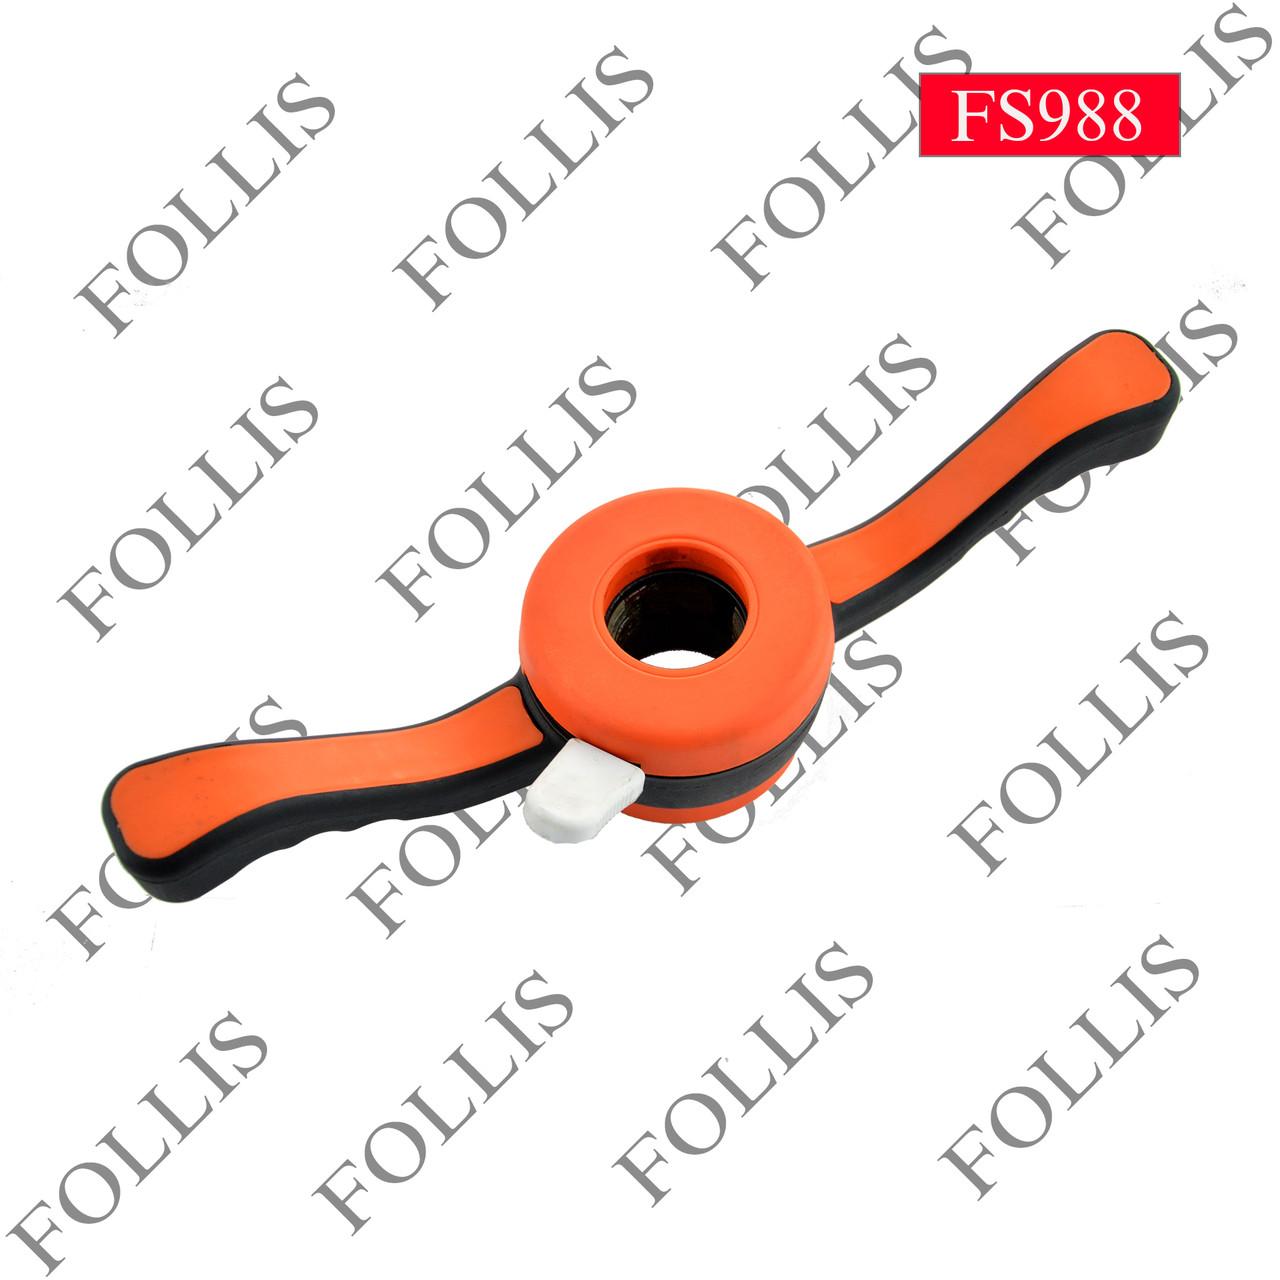 Ключ для балансировки жел LK-55 40*4T